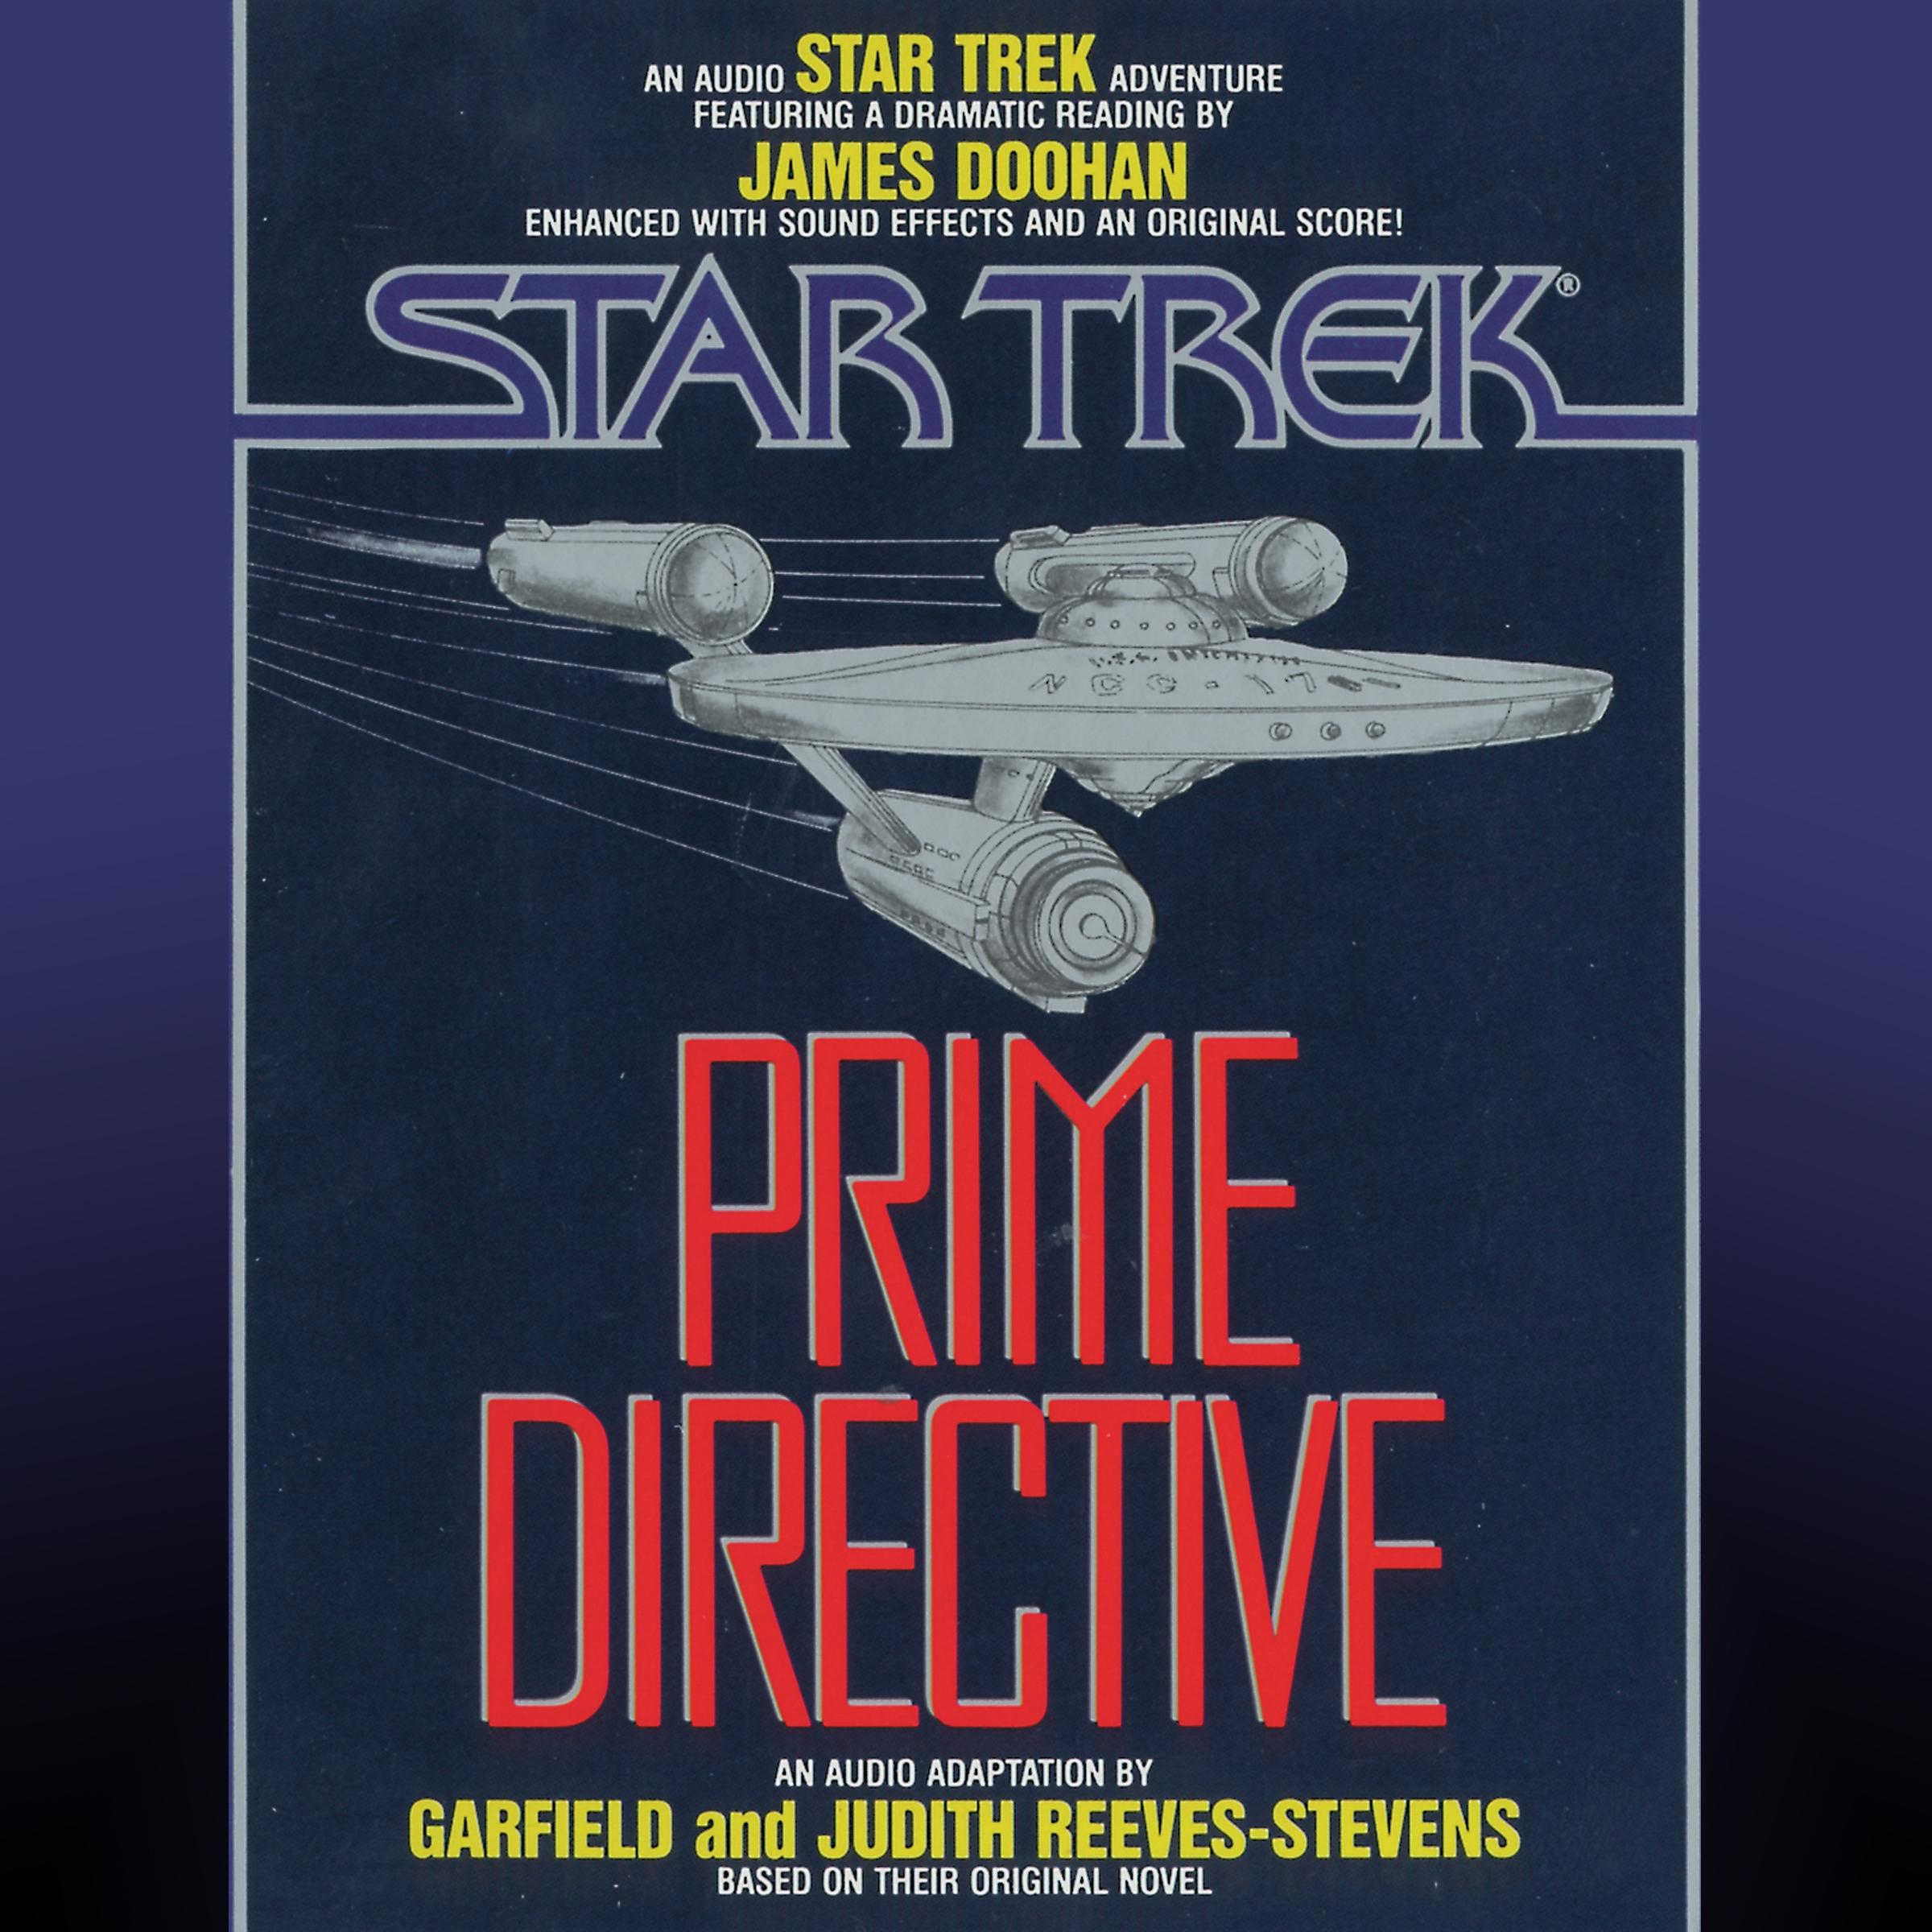 Star trek prime directive 9780743546621 hr